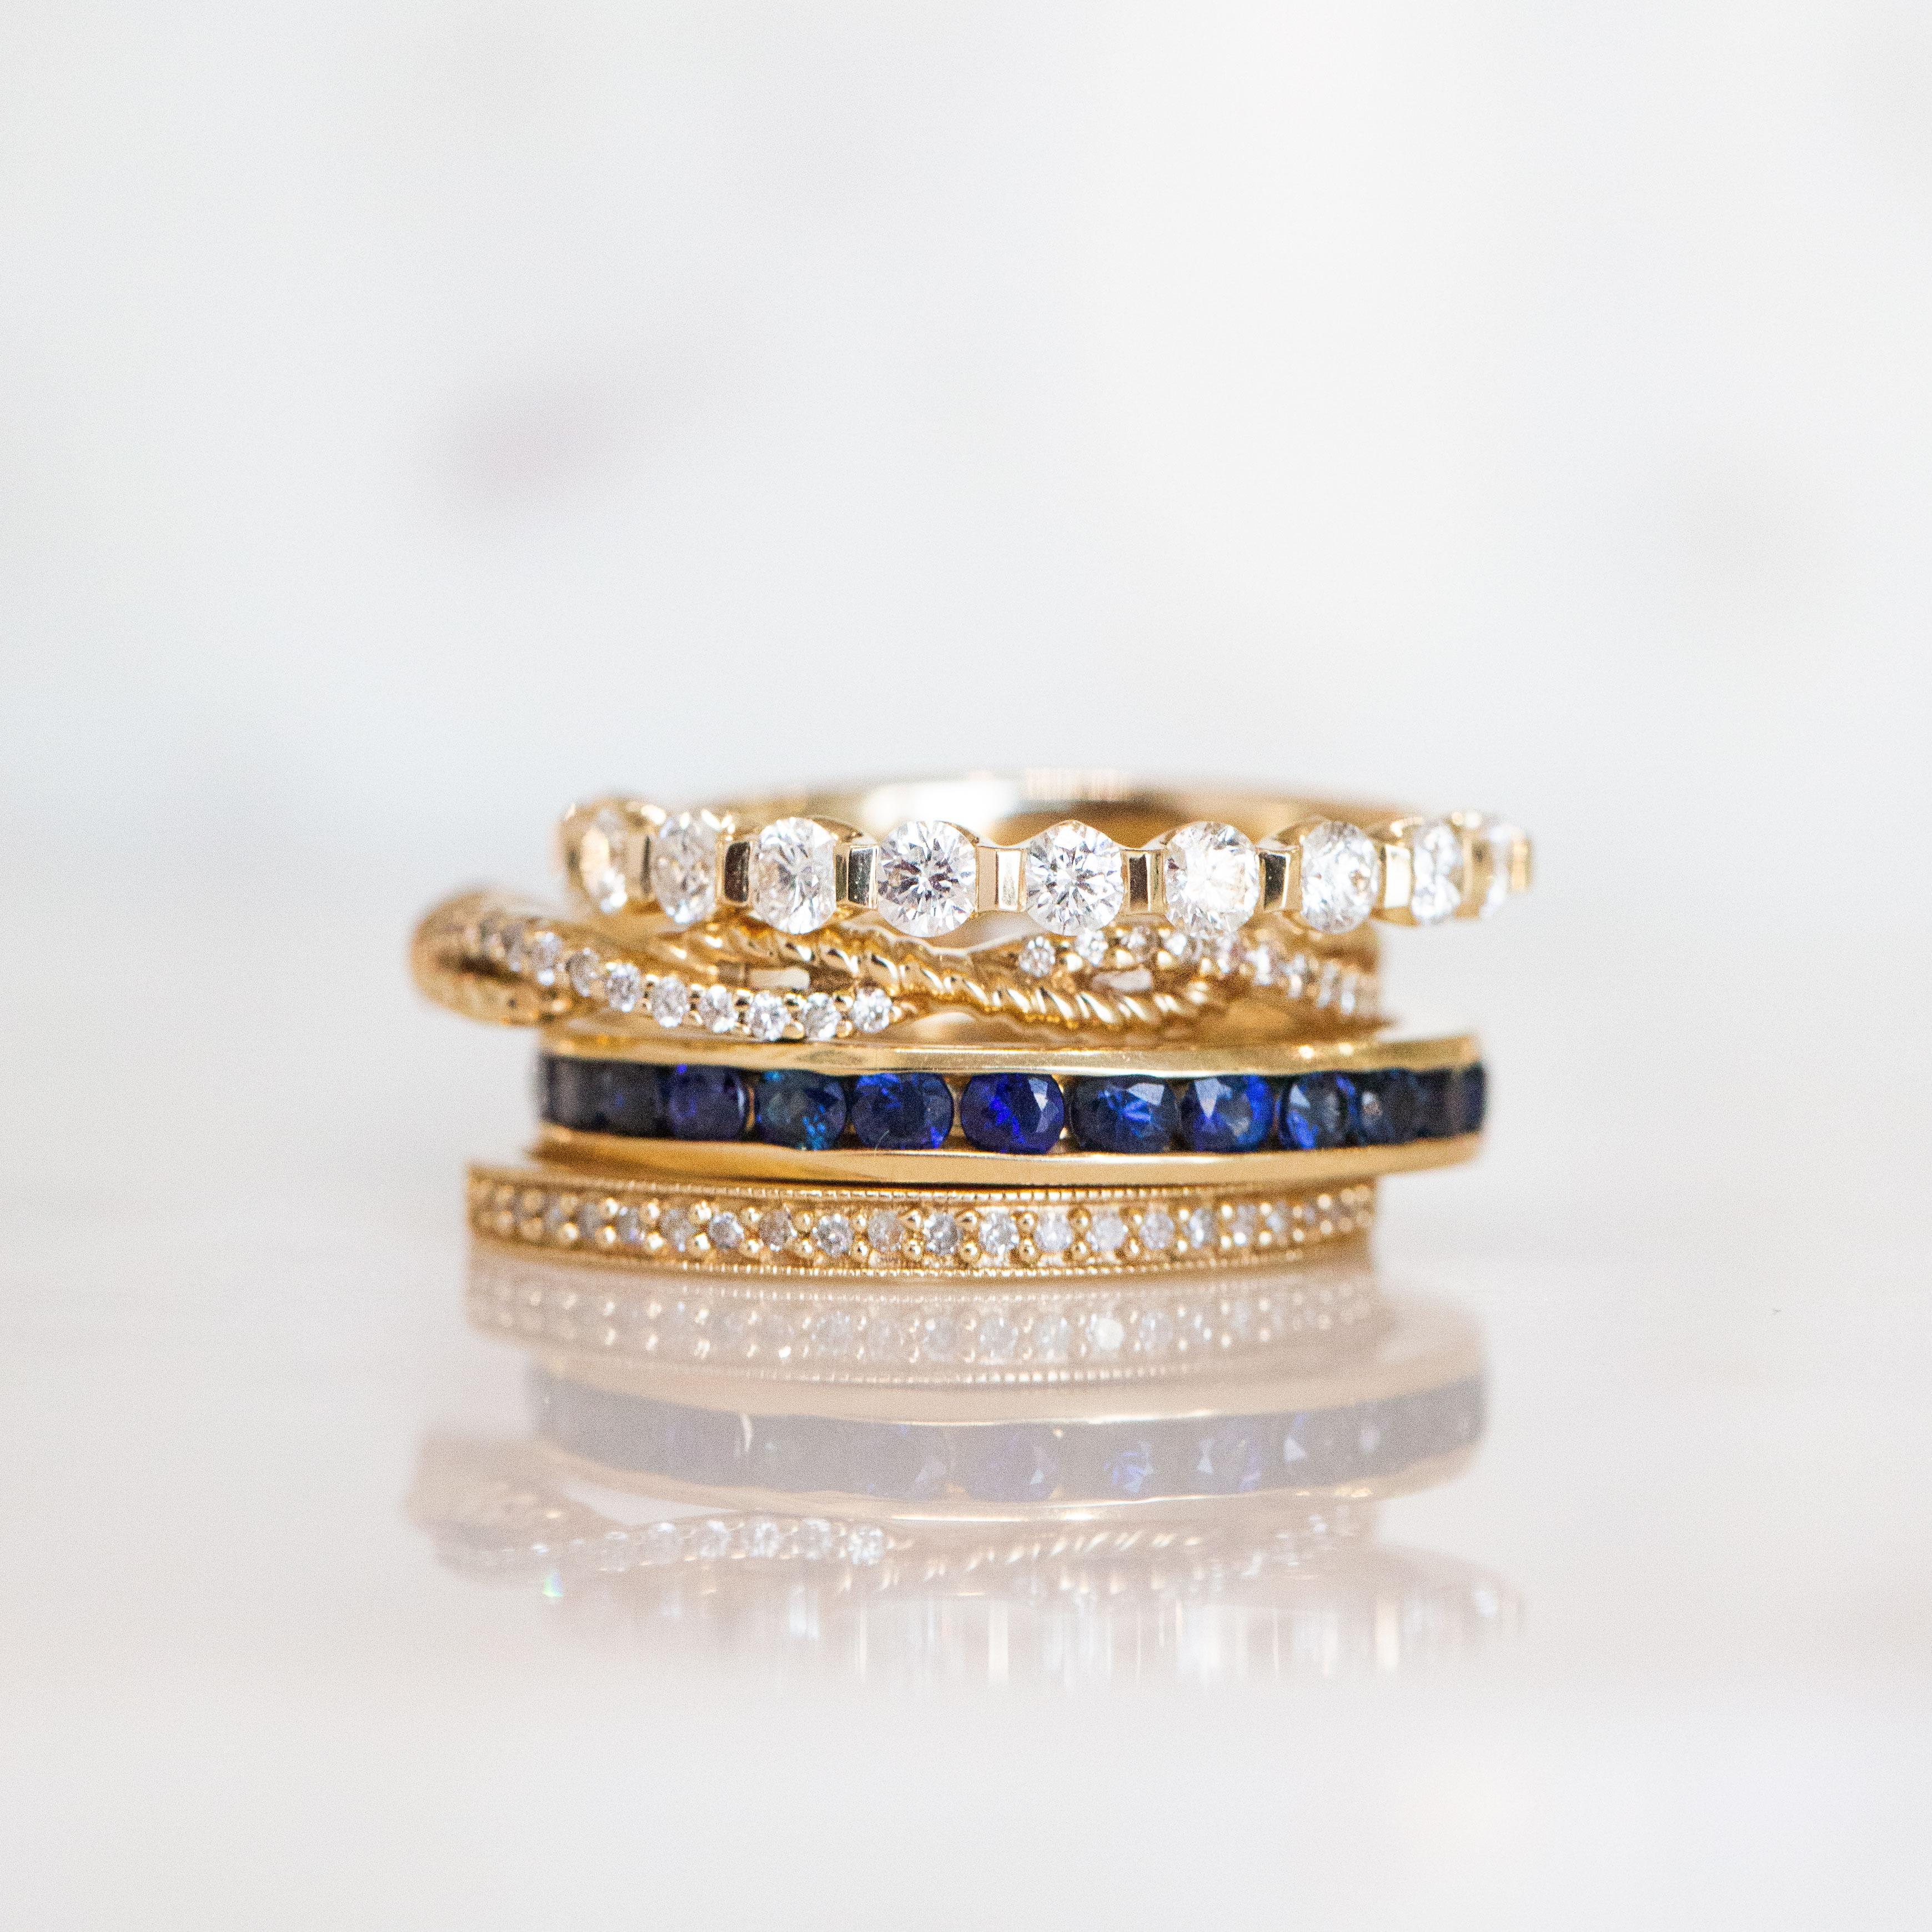 Bailey's Fine Jewelry image 2